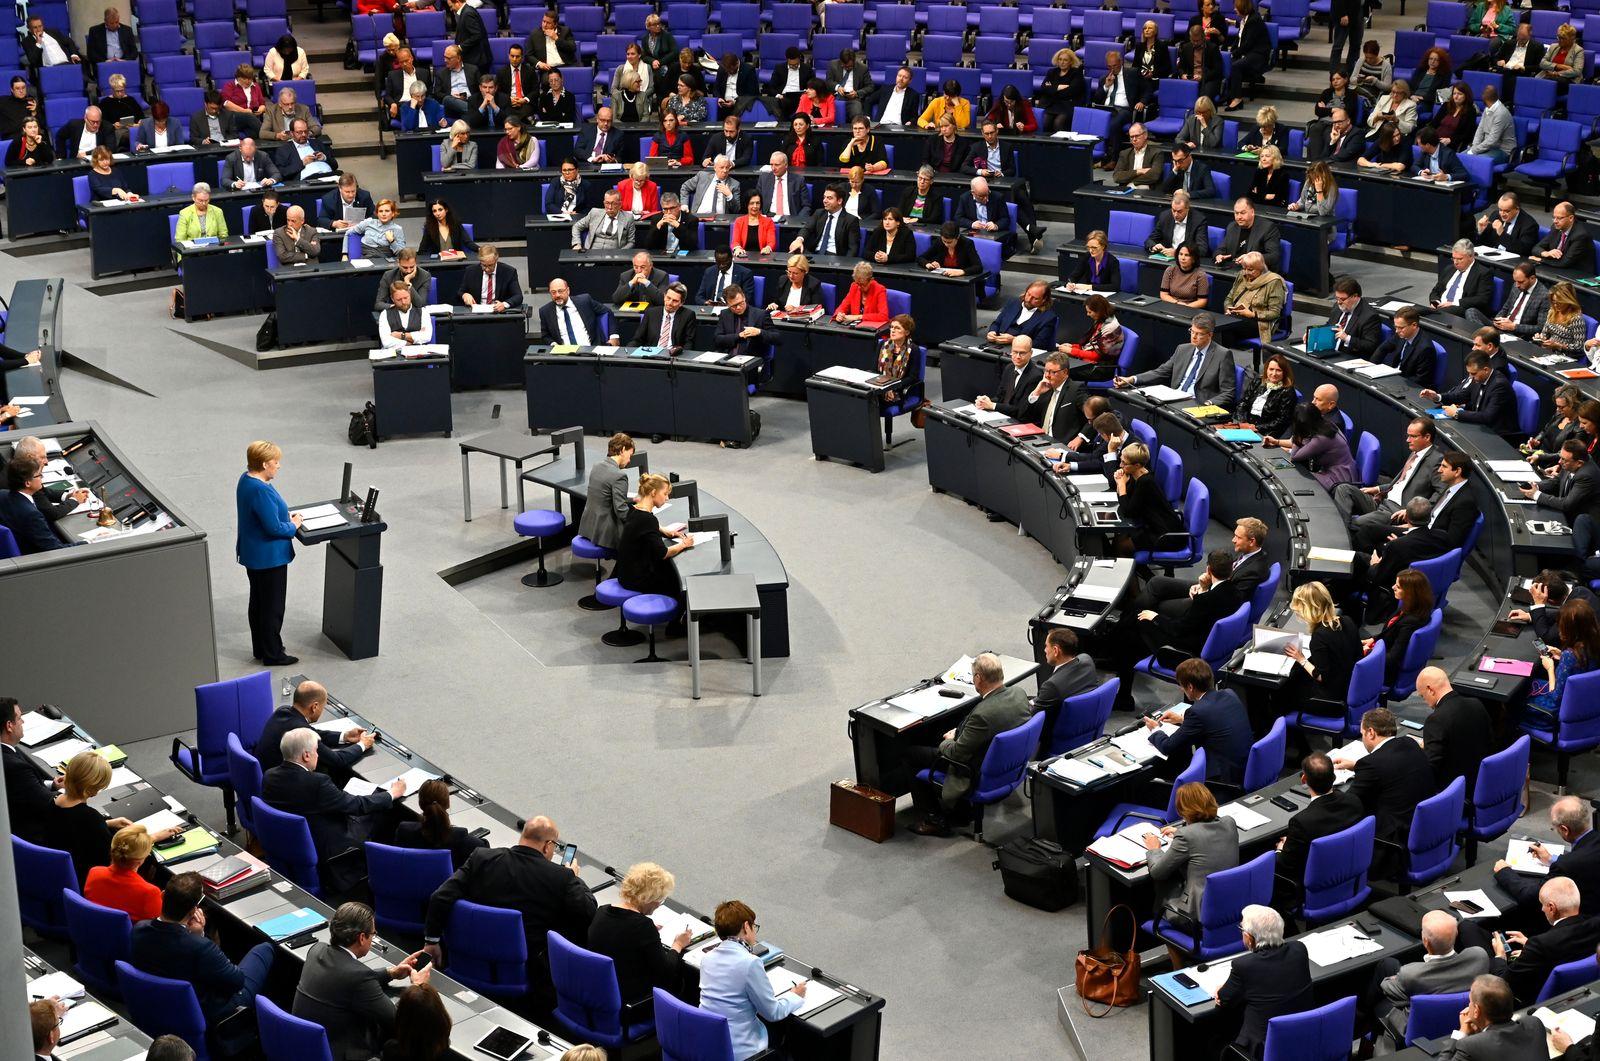 GERMANY-EU-BREXIT-GOVERNMENT-PARLIAMENT